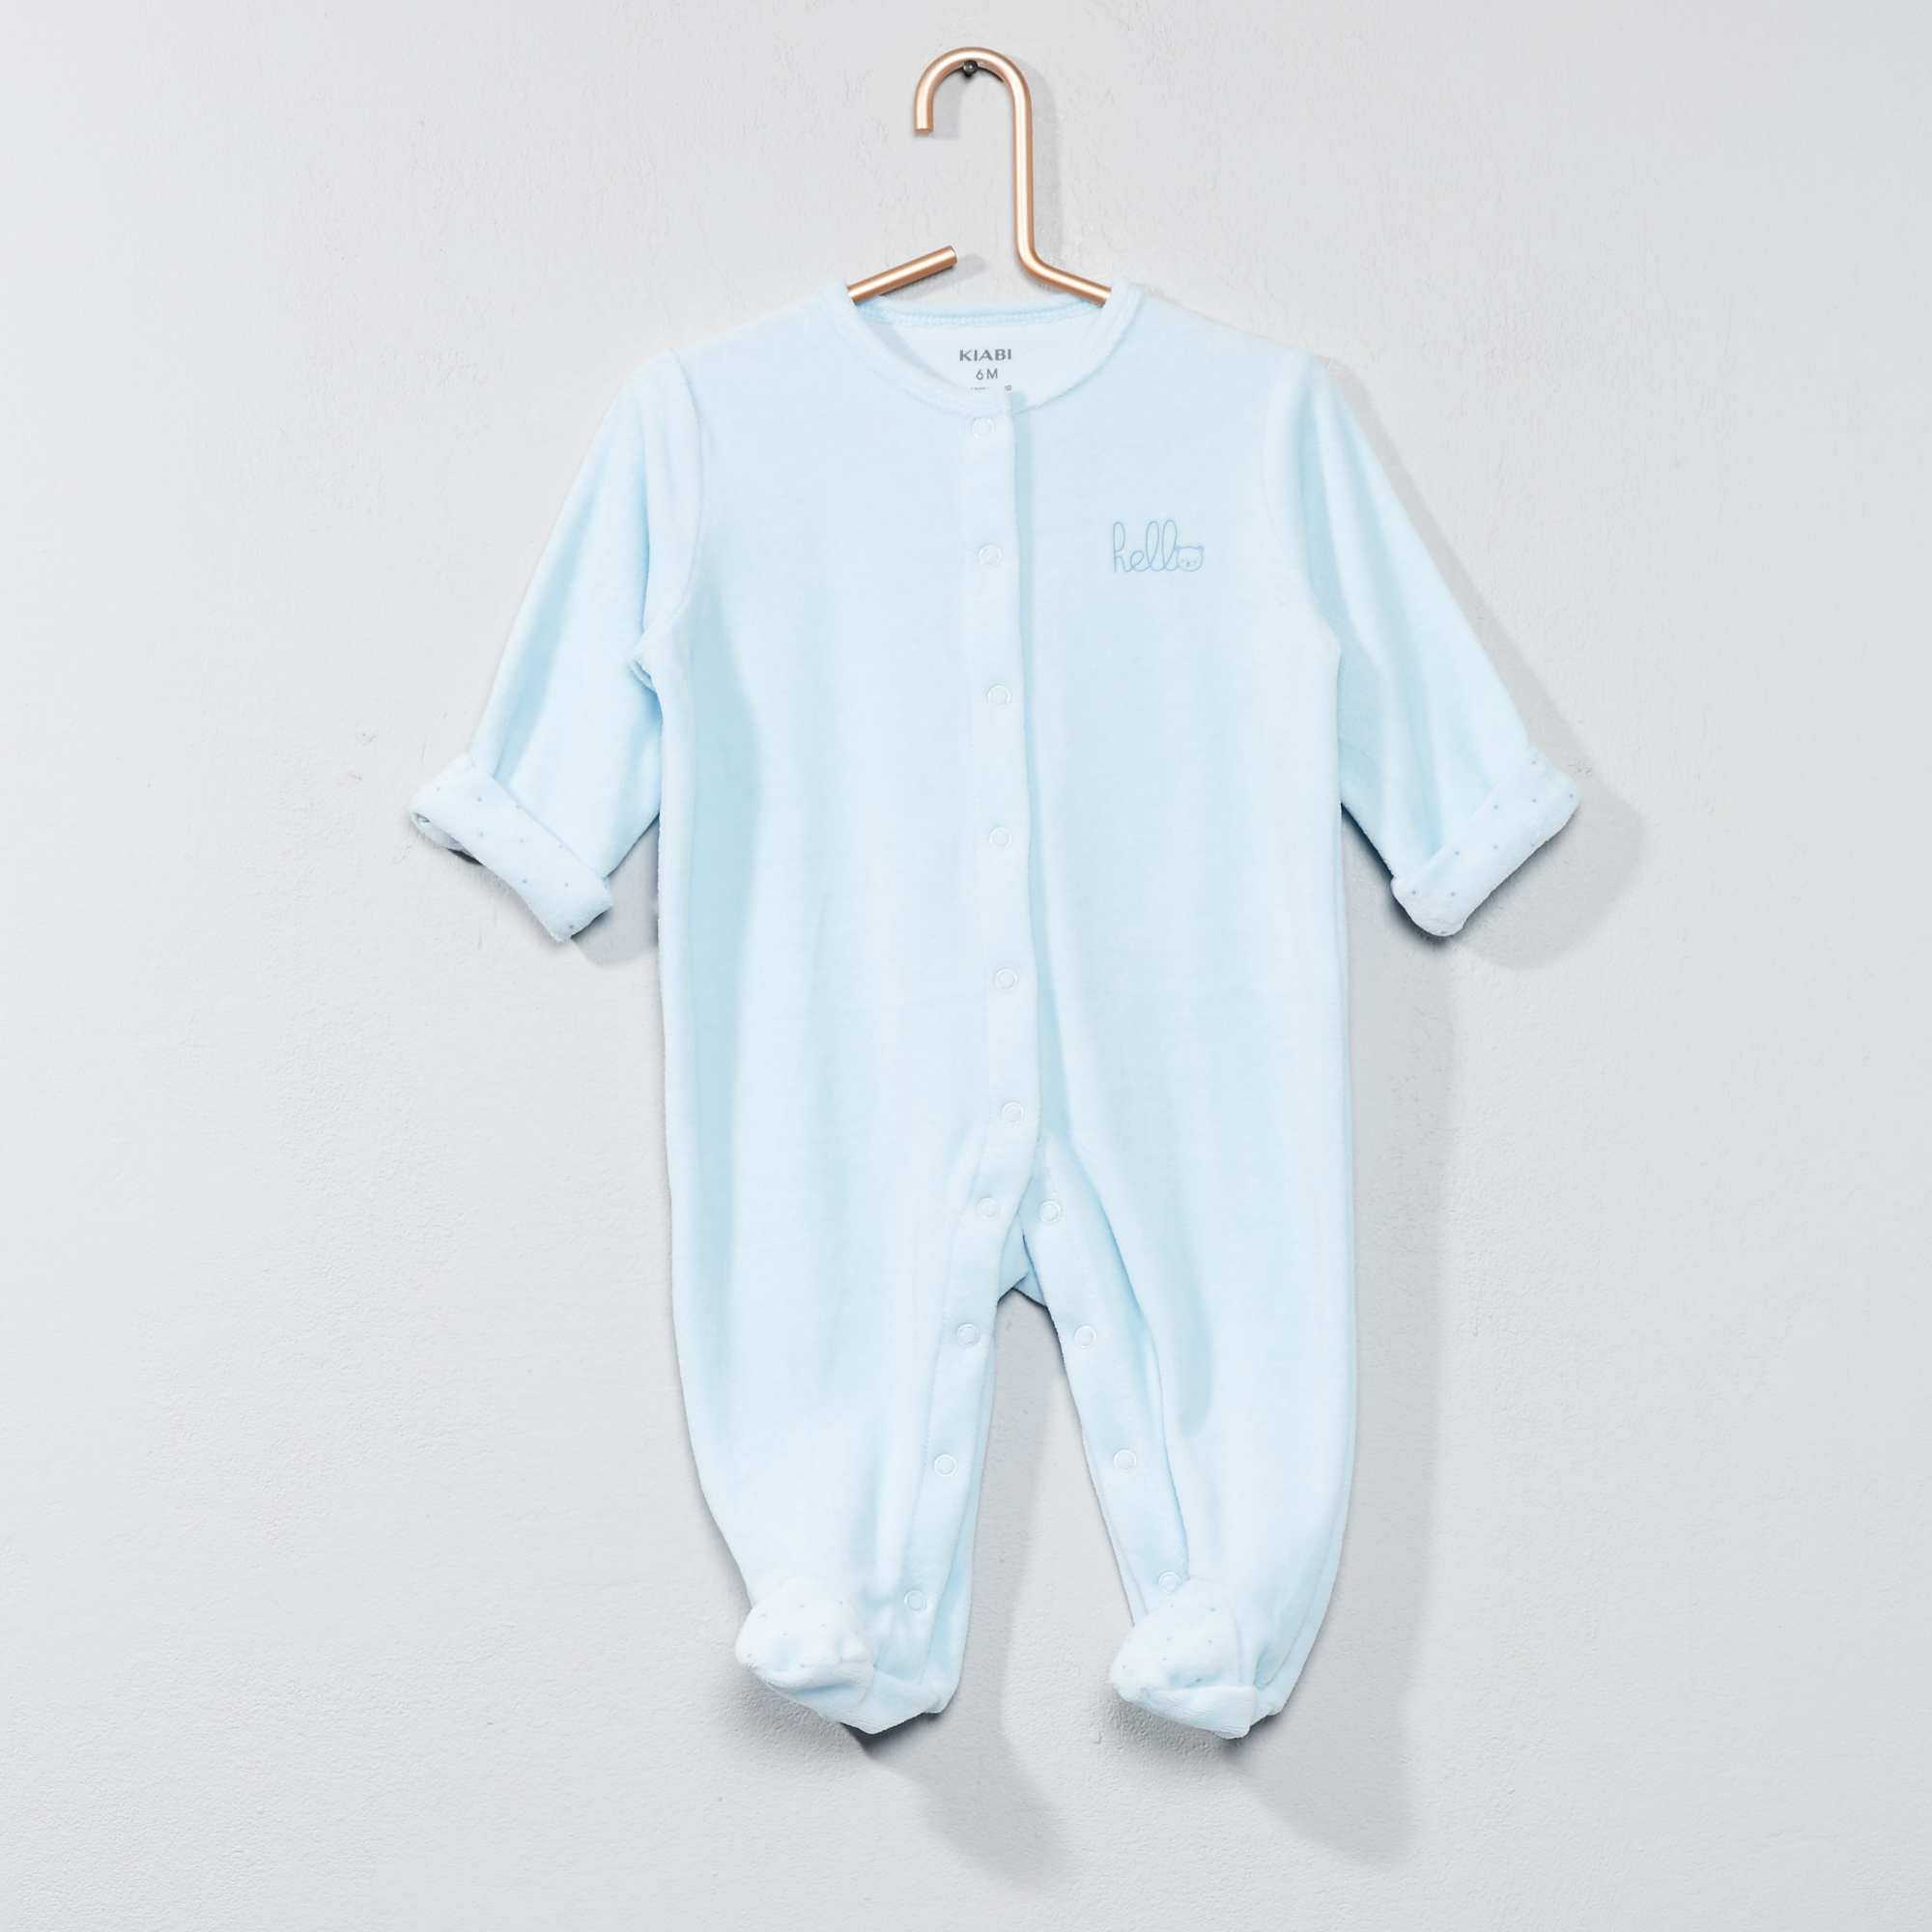 053449e1e37d4 Pyjama en velours  hello  en coton biologique bleu Bébé garçon. Loading zoom